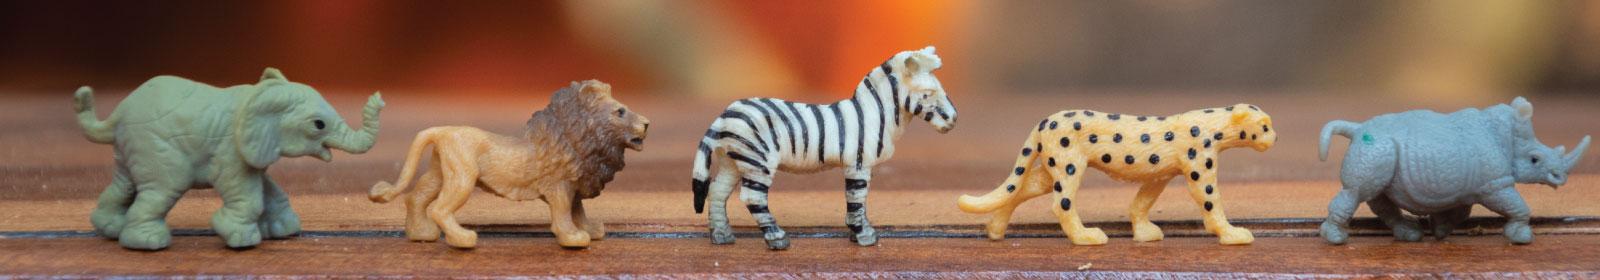 Brinquedos Mundo Animal